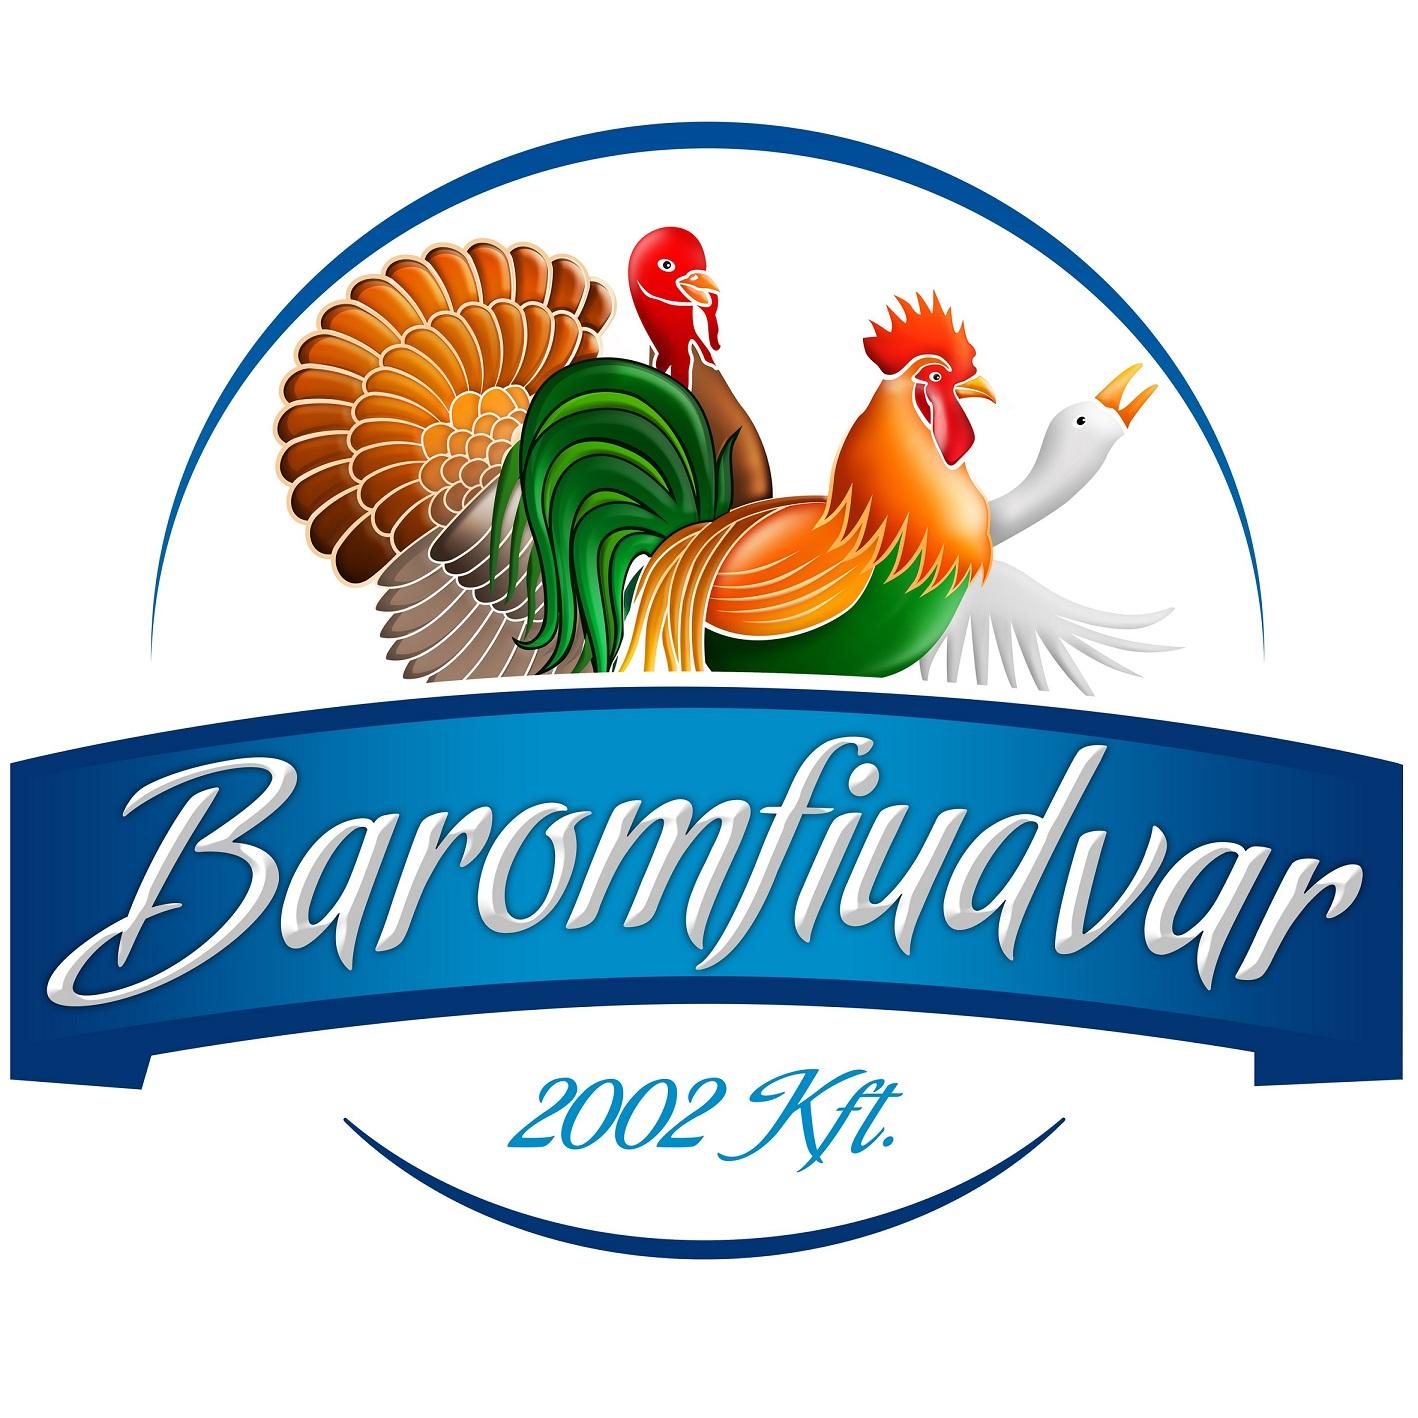 1350472848-bu-logo-vegleges-2012-05-24-25x25cm.jpg